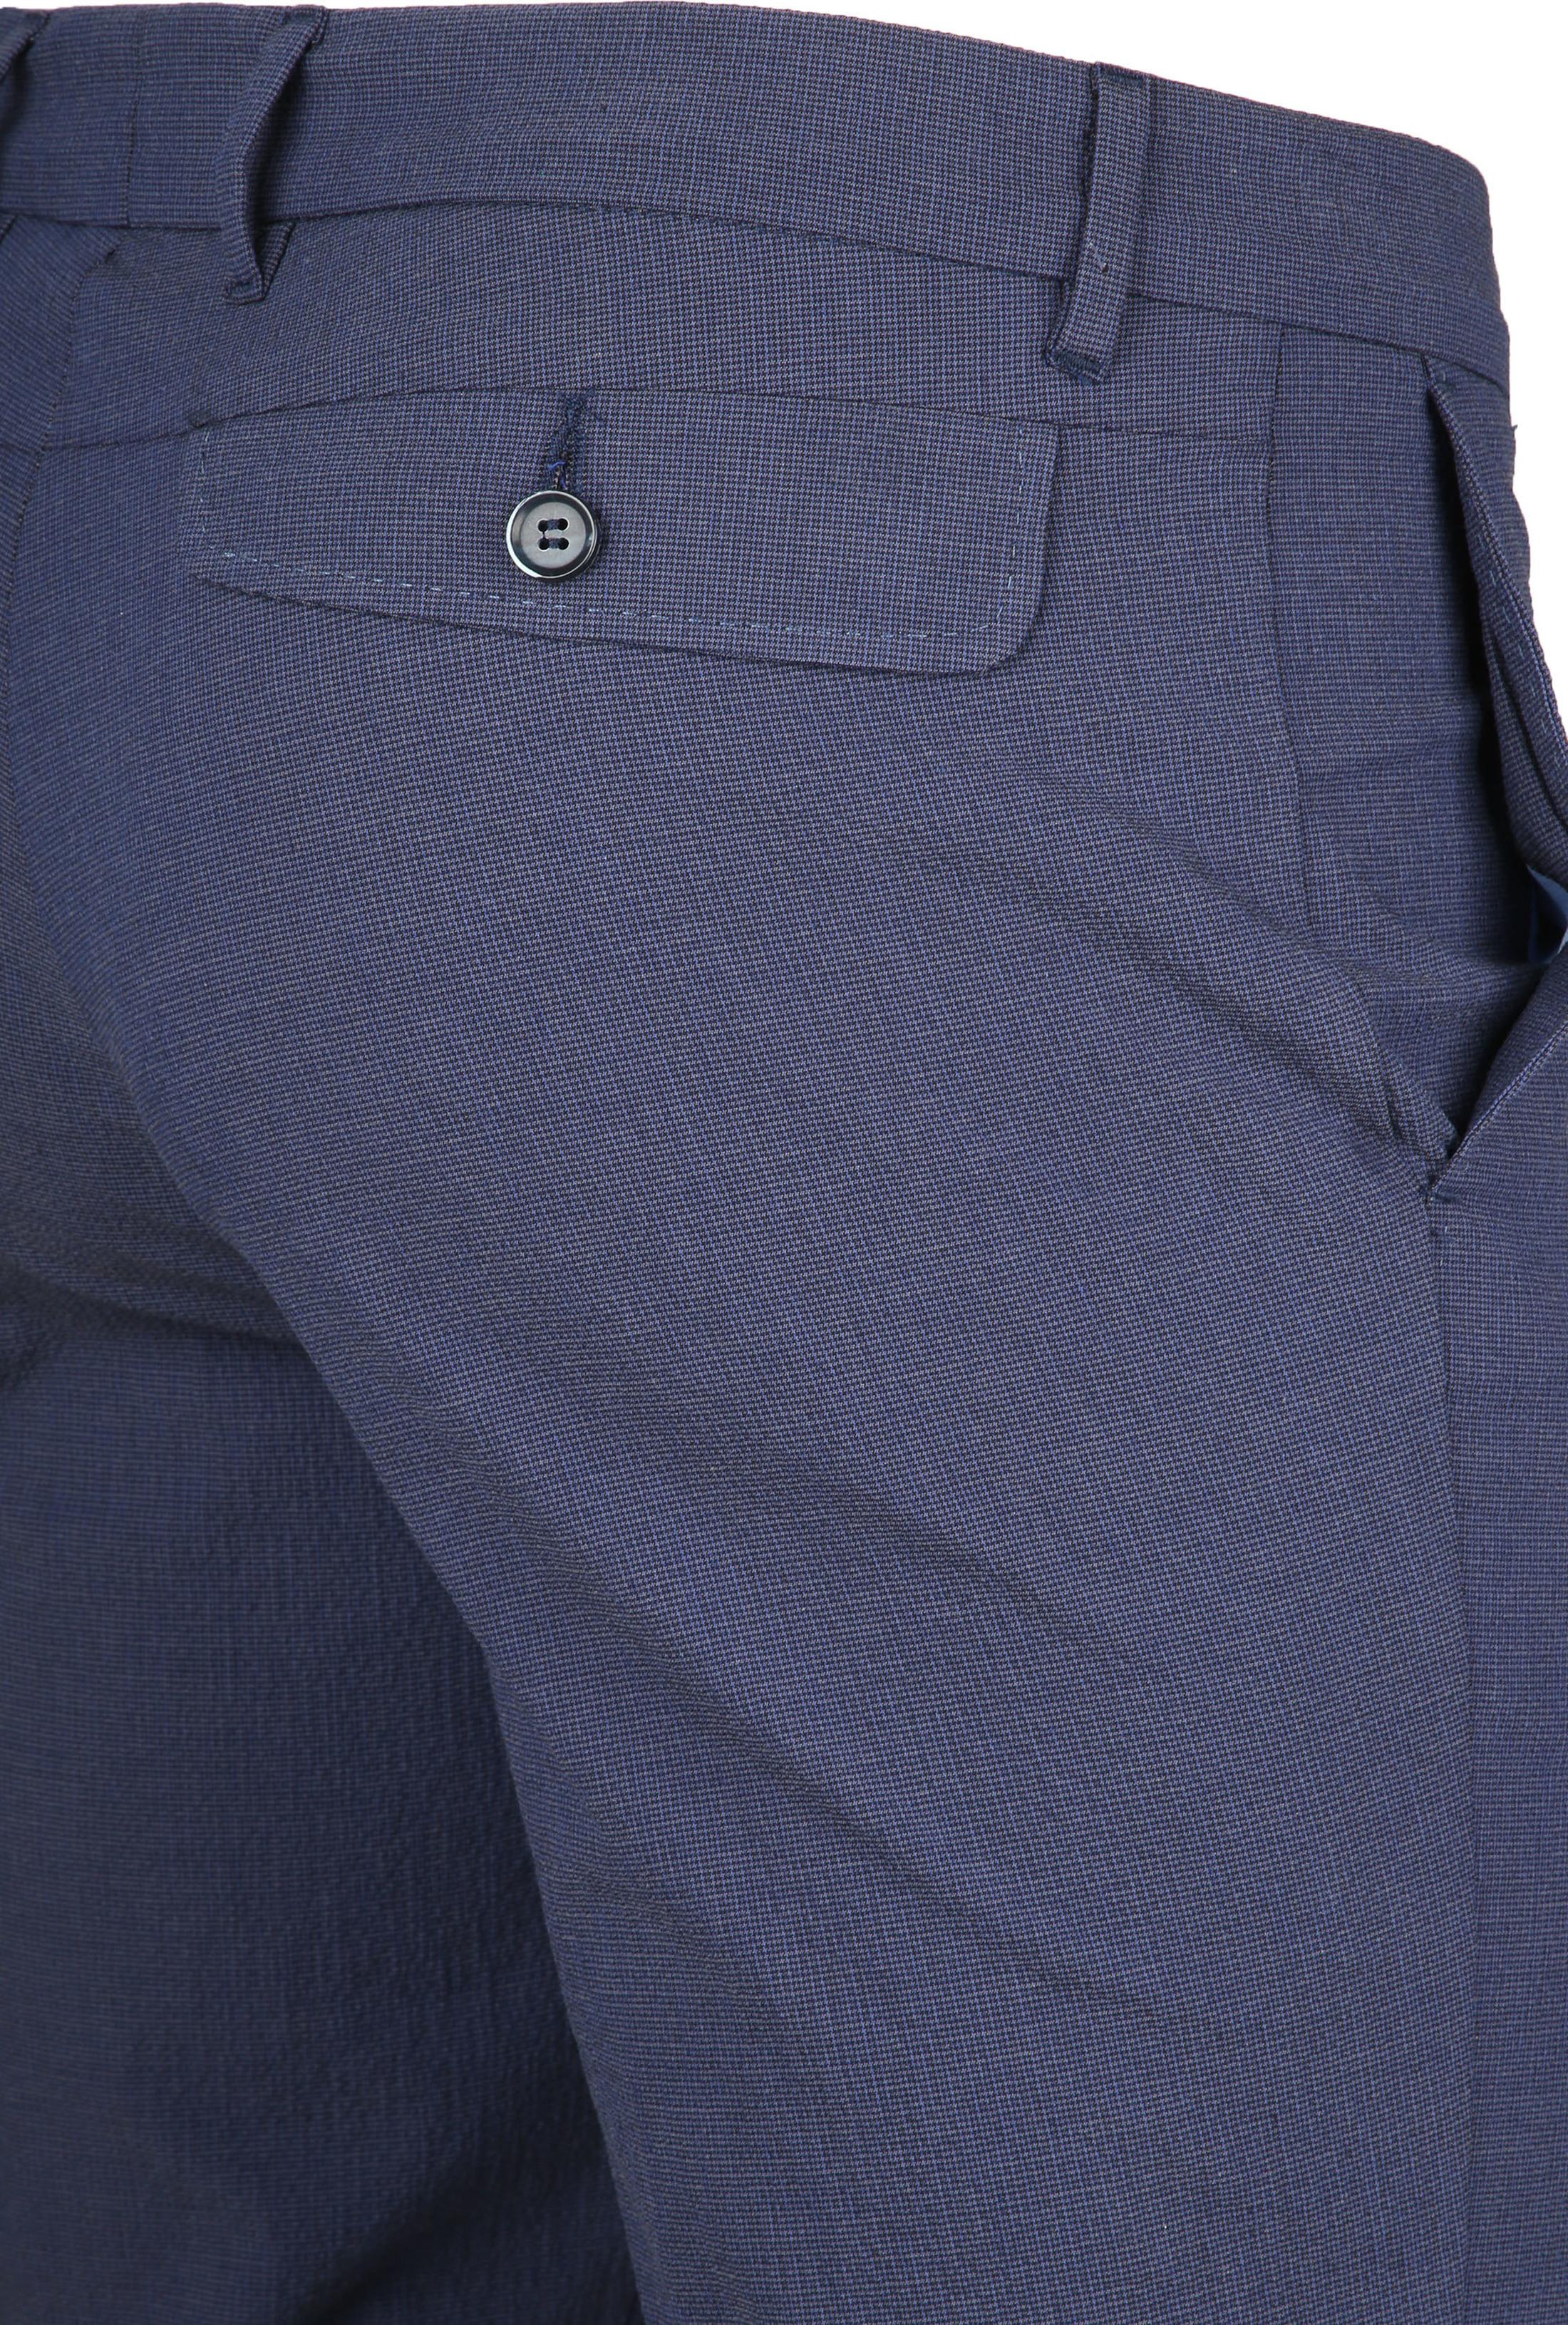 Suitable Pantalon Pisa Dessin Blauw foto 1